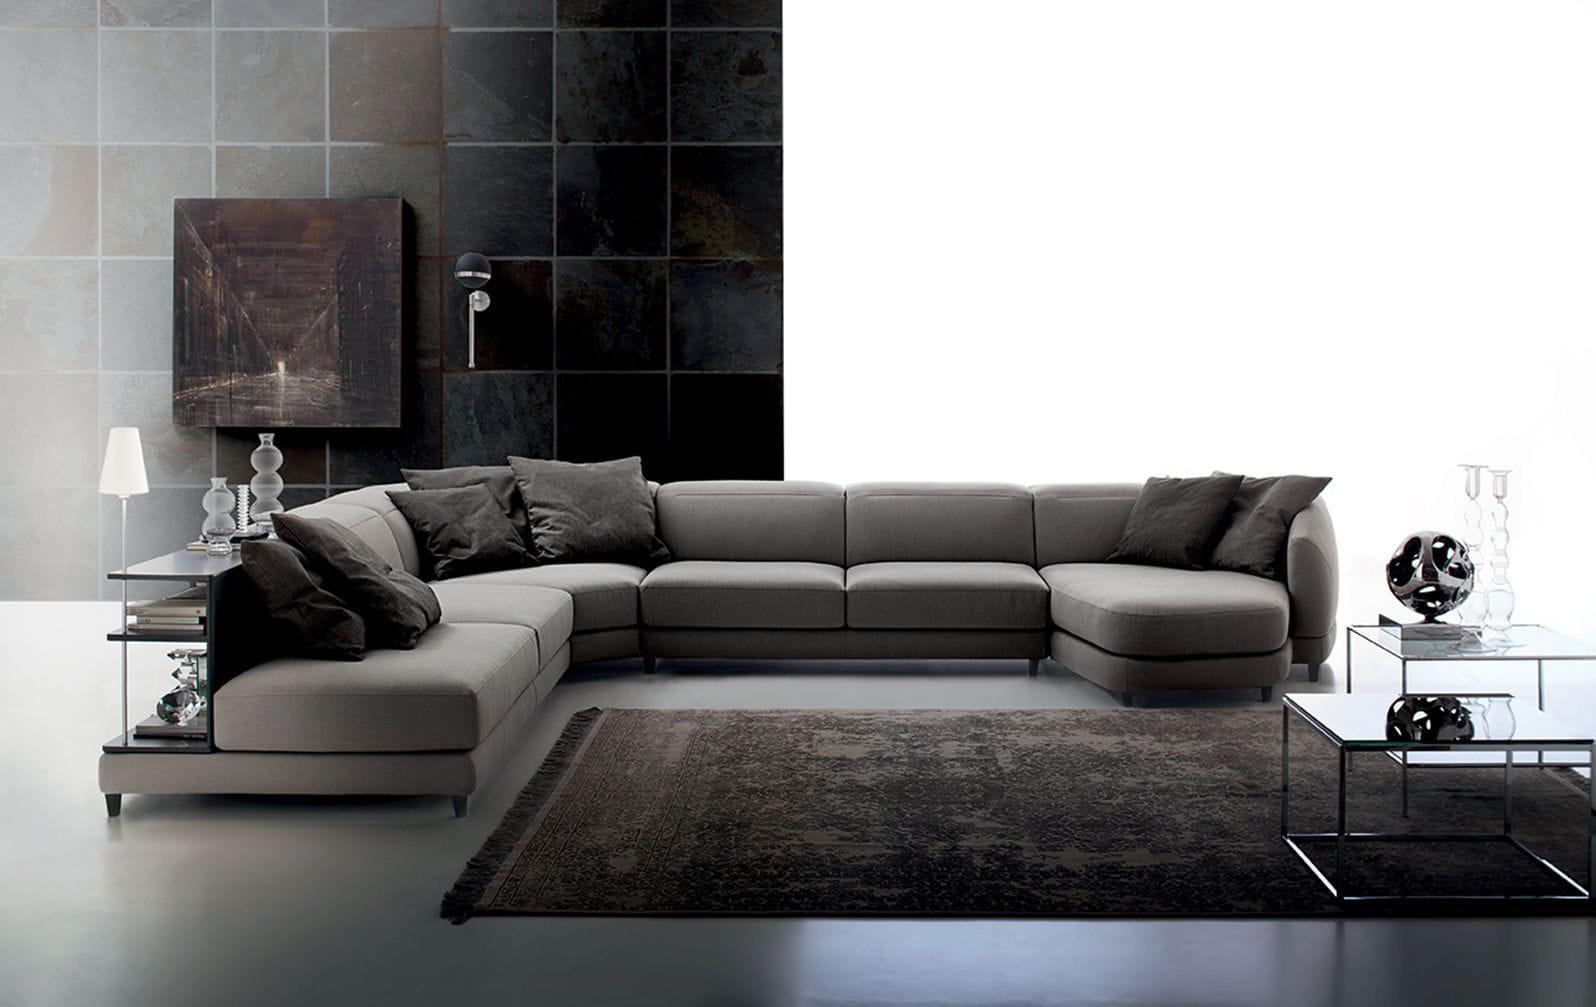 Divano modulare / d\'angolo / moderno / in pelle - DUNN by Spessotto ...